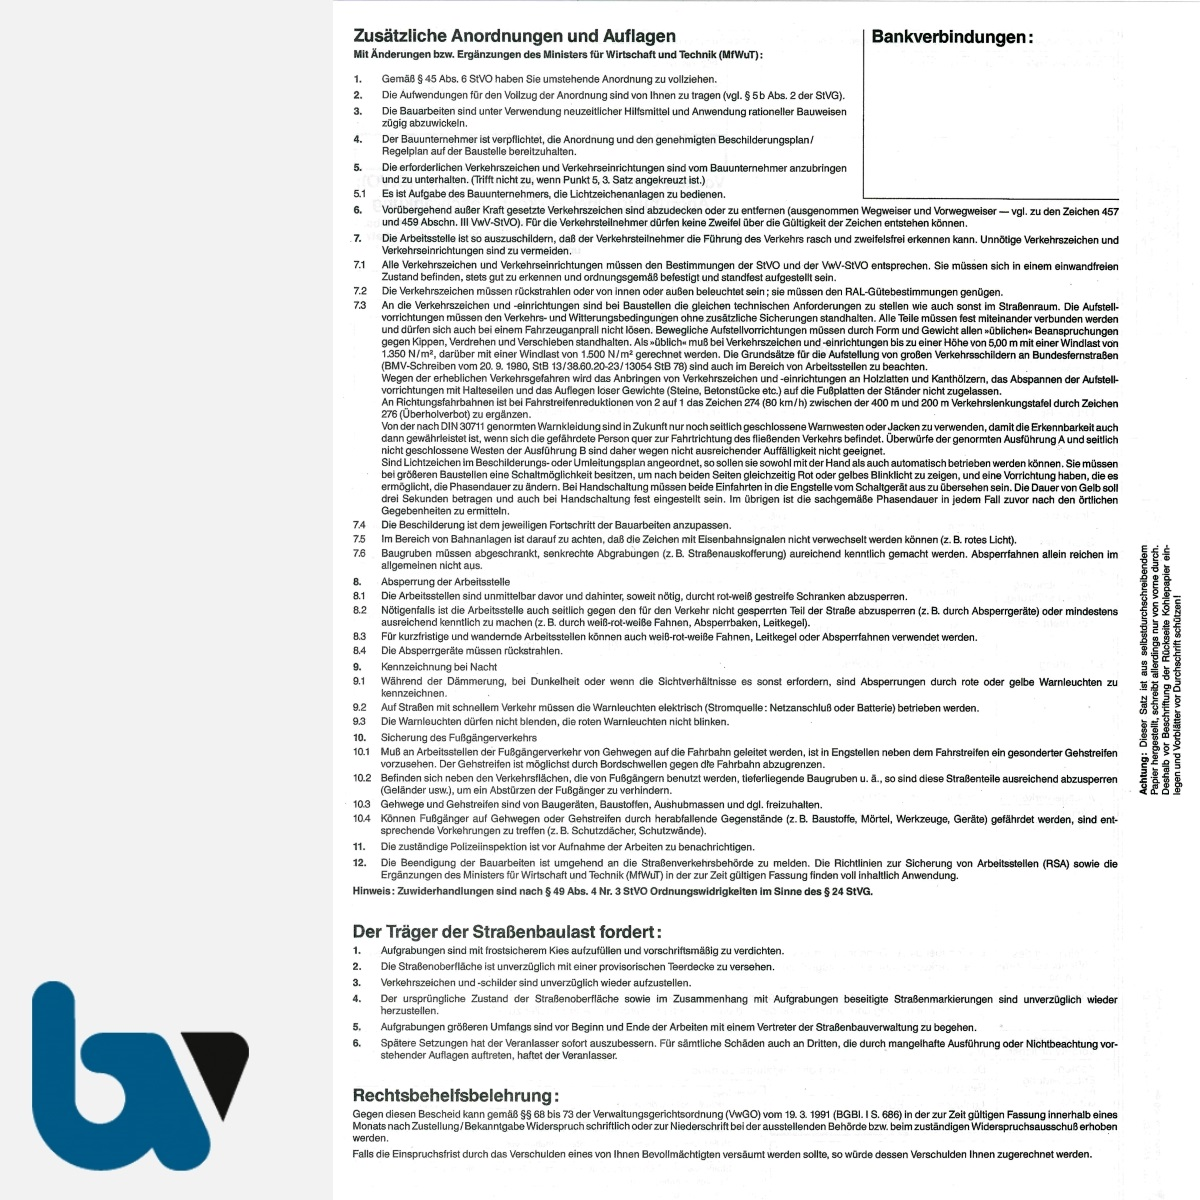 0/497-3 Anordnung Verkehrsbeschränkung Vollzug 44 45 Straßenverkehrsordnung StVO Arbeiten Verkehrsraum Straßenraum selbstdurchschreibend DIN A4 5-fach RS | Borgard Verlag GmbH